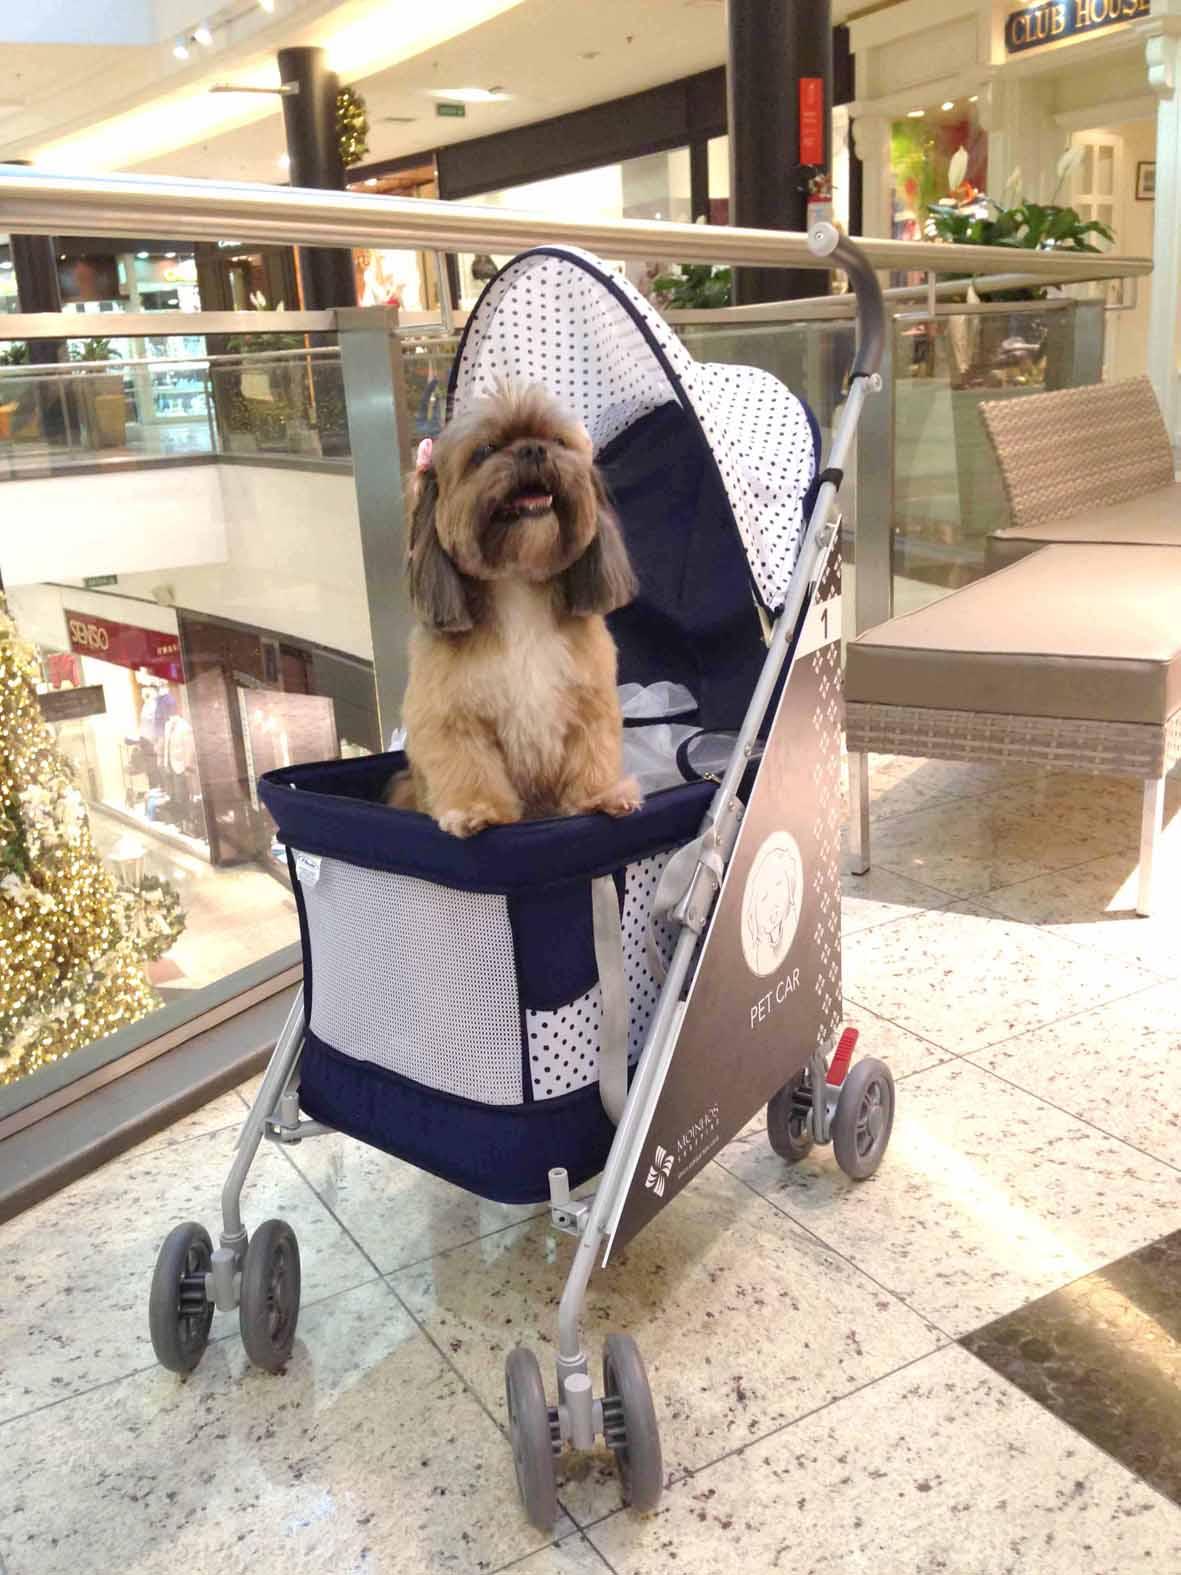 00 Matilda - Pet Car - Moinhos Shoppping (1) (2)